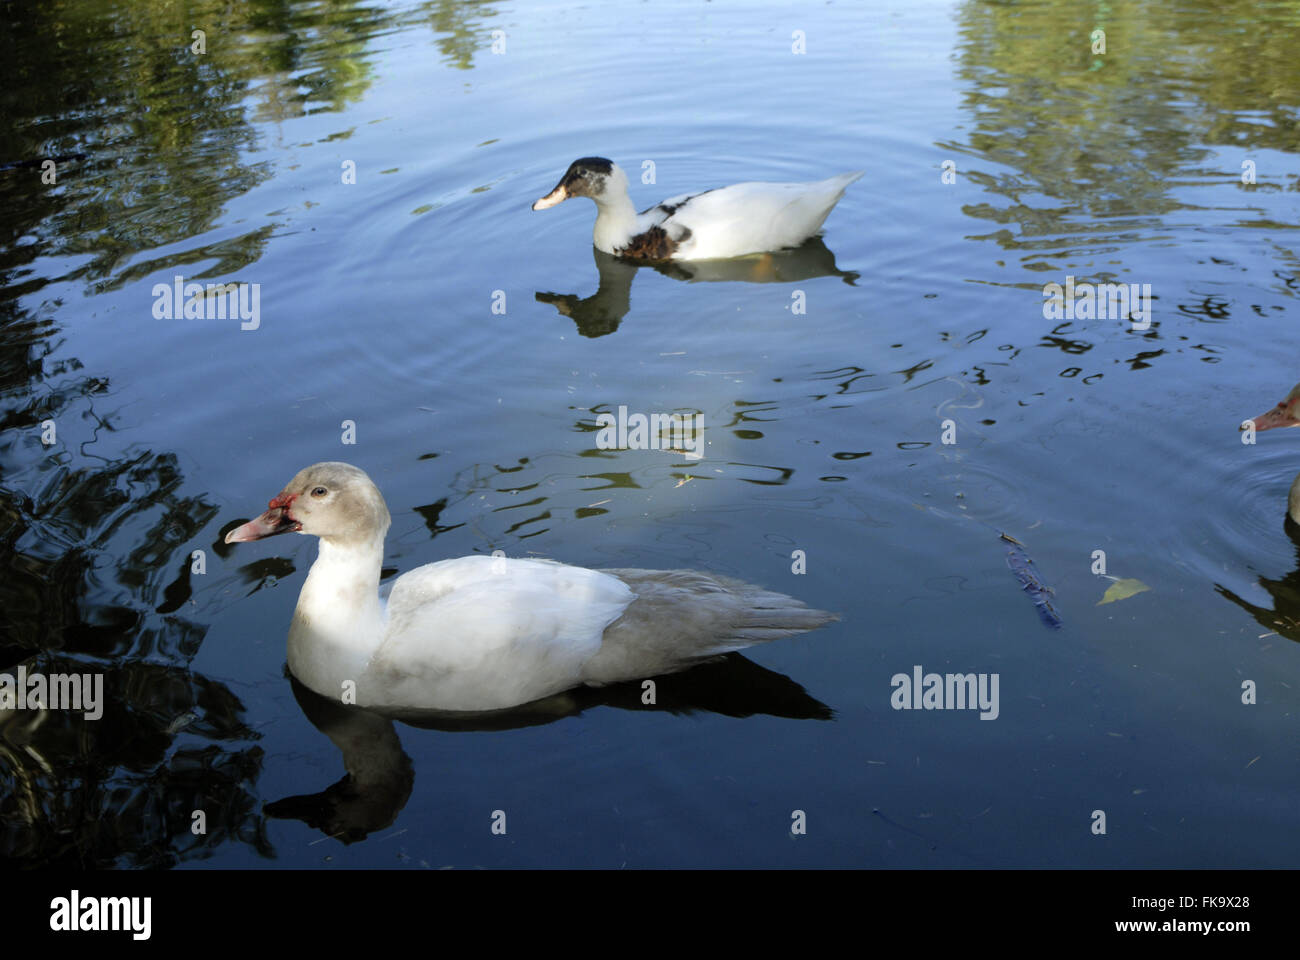 Ducks in the pond - Anatidae - Stock Image